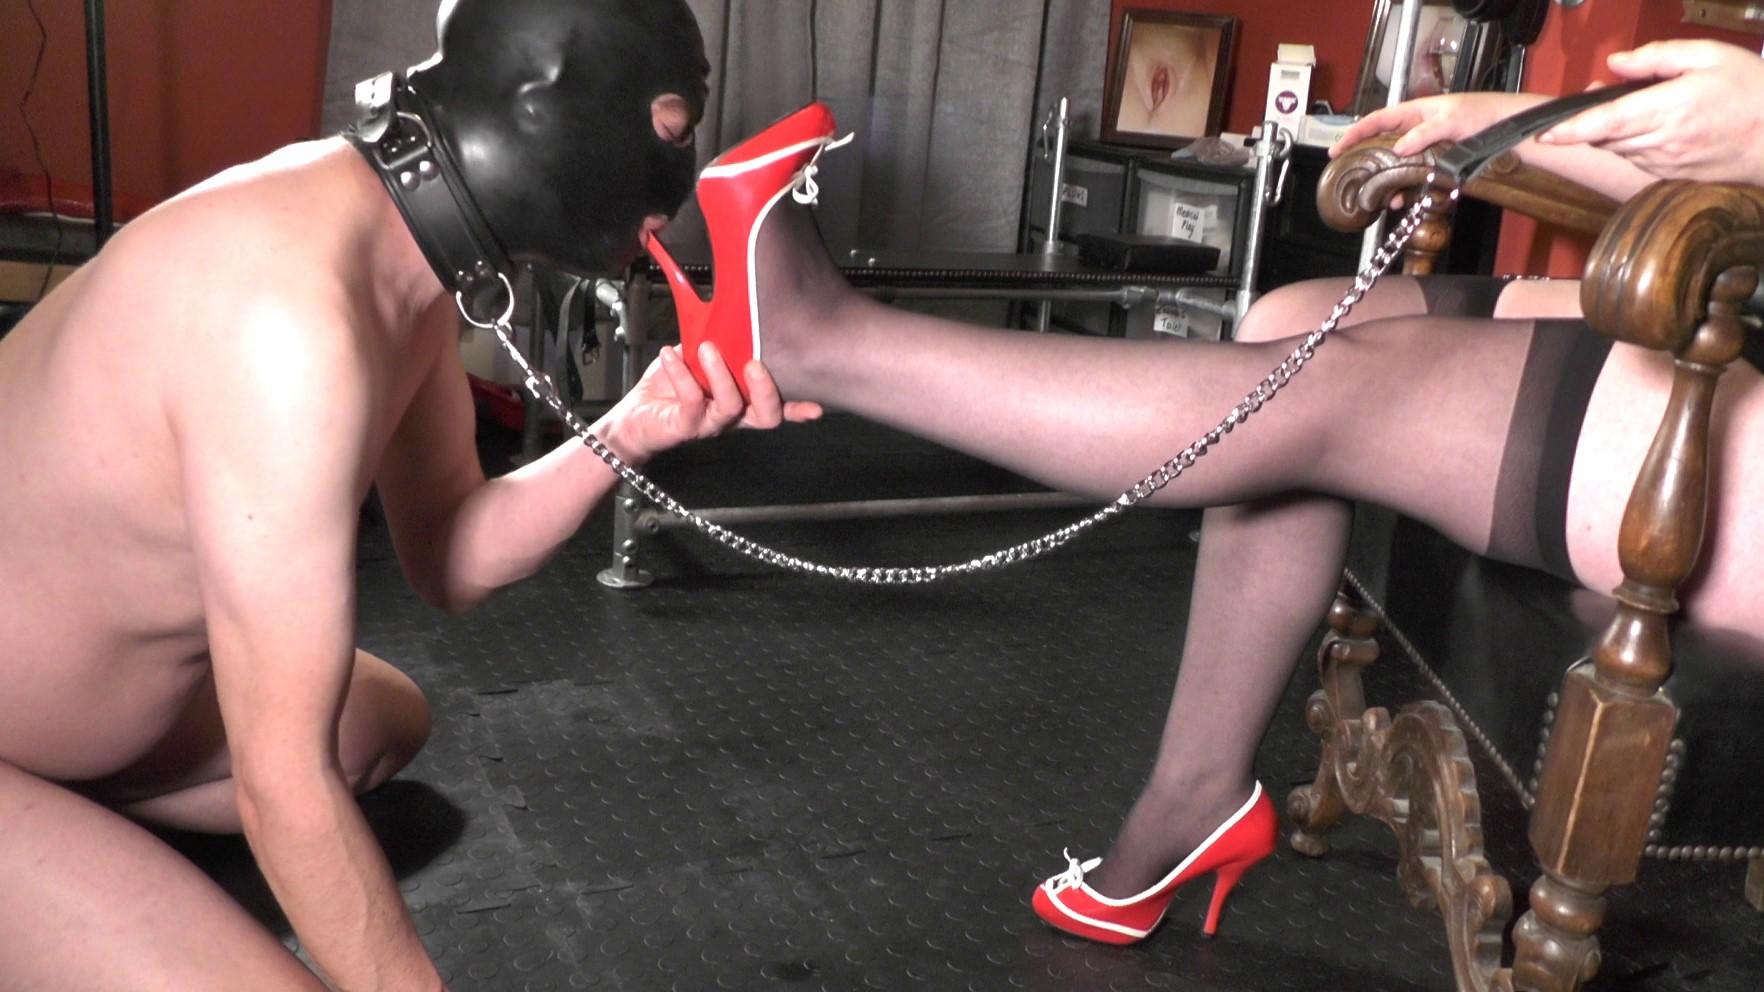 mistress foot fetish sessions